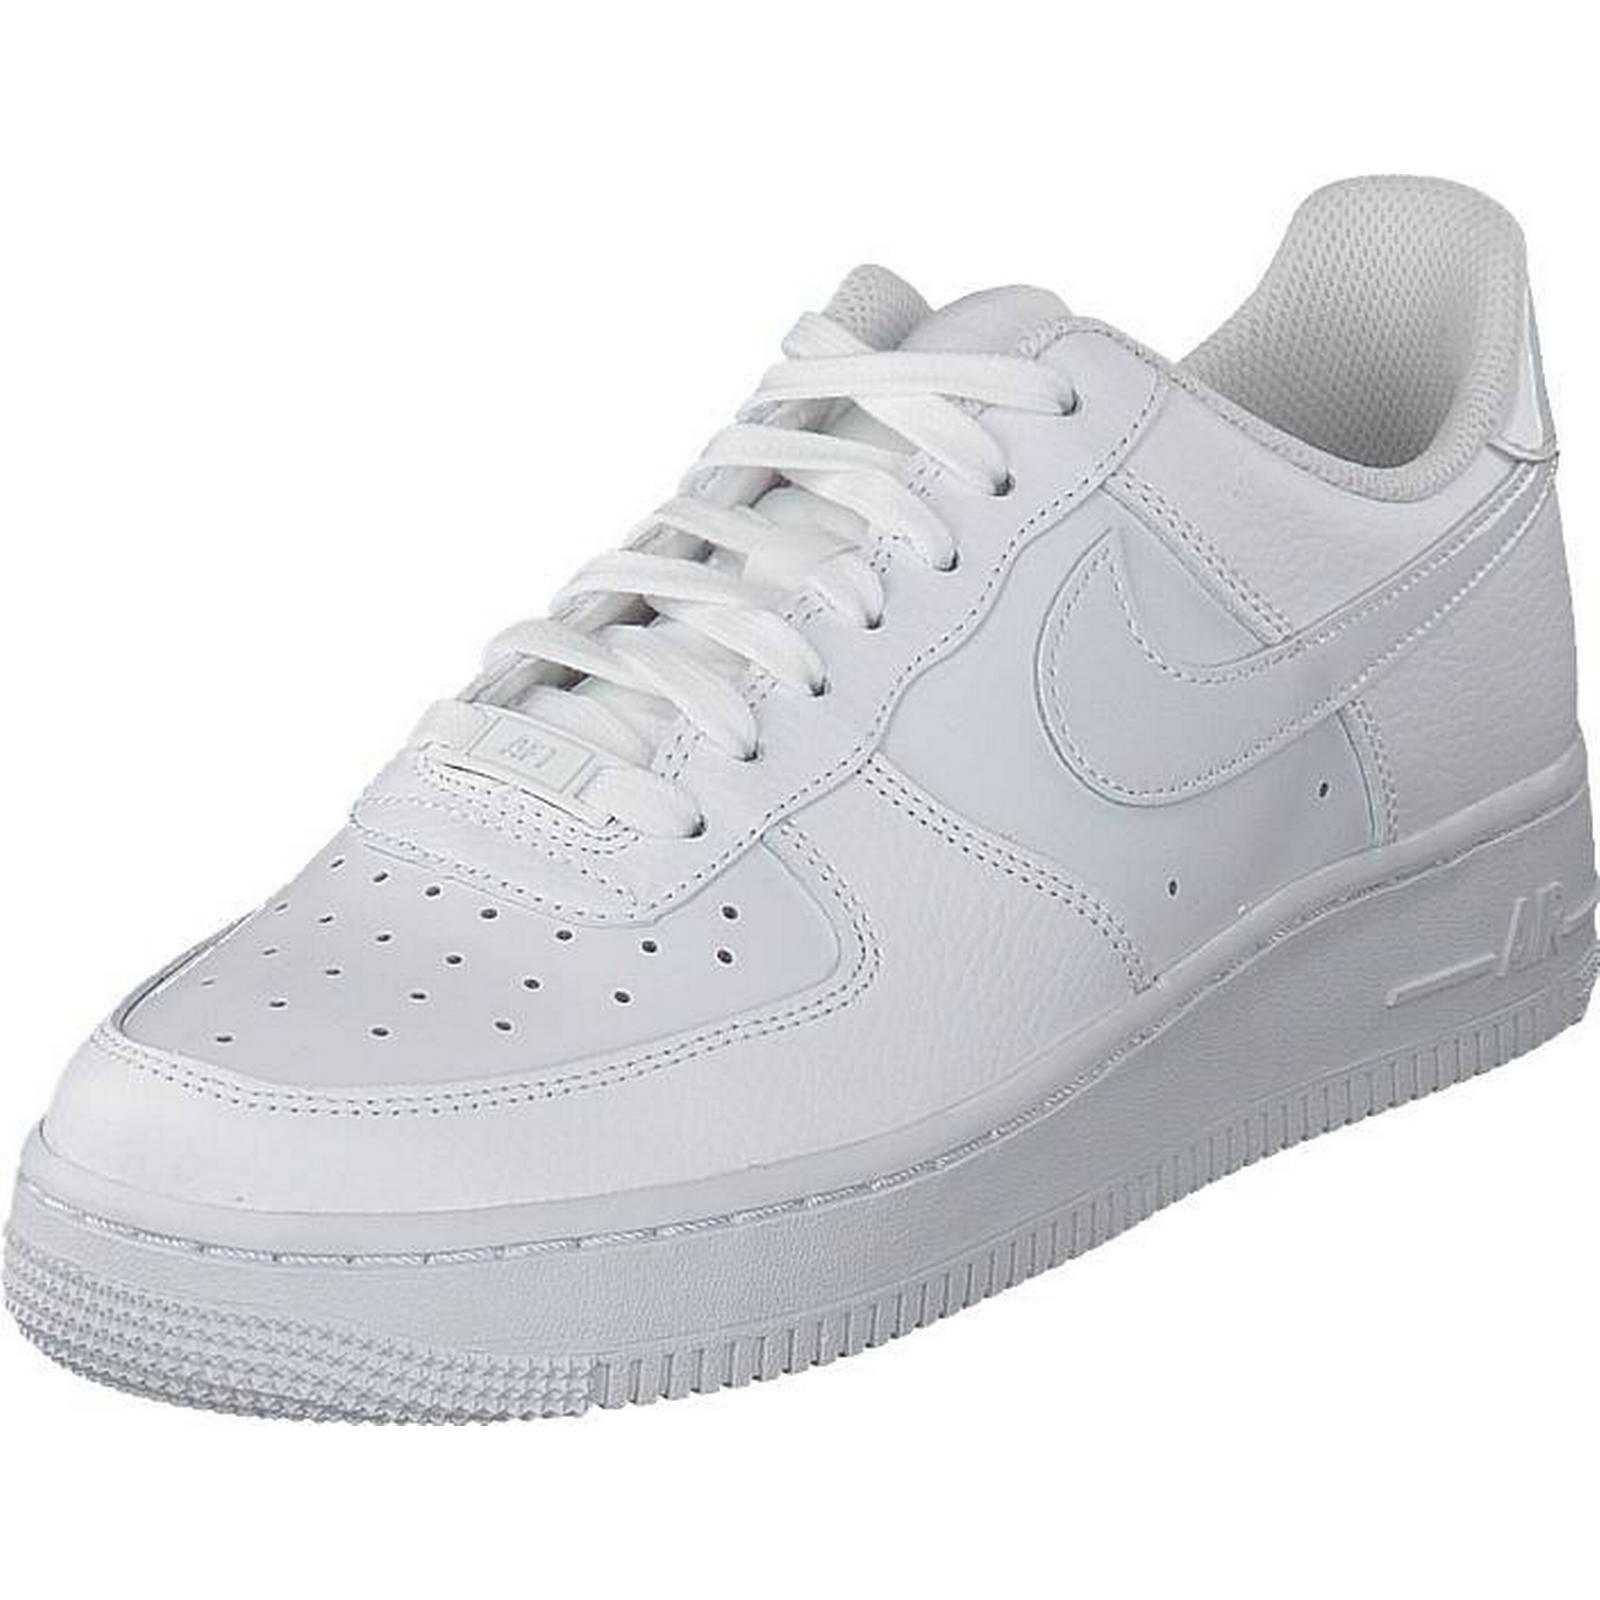 Mr/Ms < Nike Wmns White/white, Air Force 1 &#x27;07 White/white, Wmns Shoes, Trainers &amp; Sport Shoes , Trainers, White, Female, 38 < Clearance Sale 7e69d5